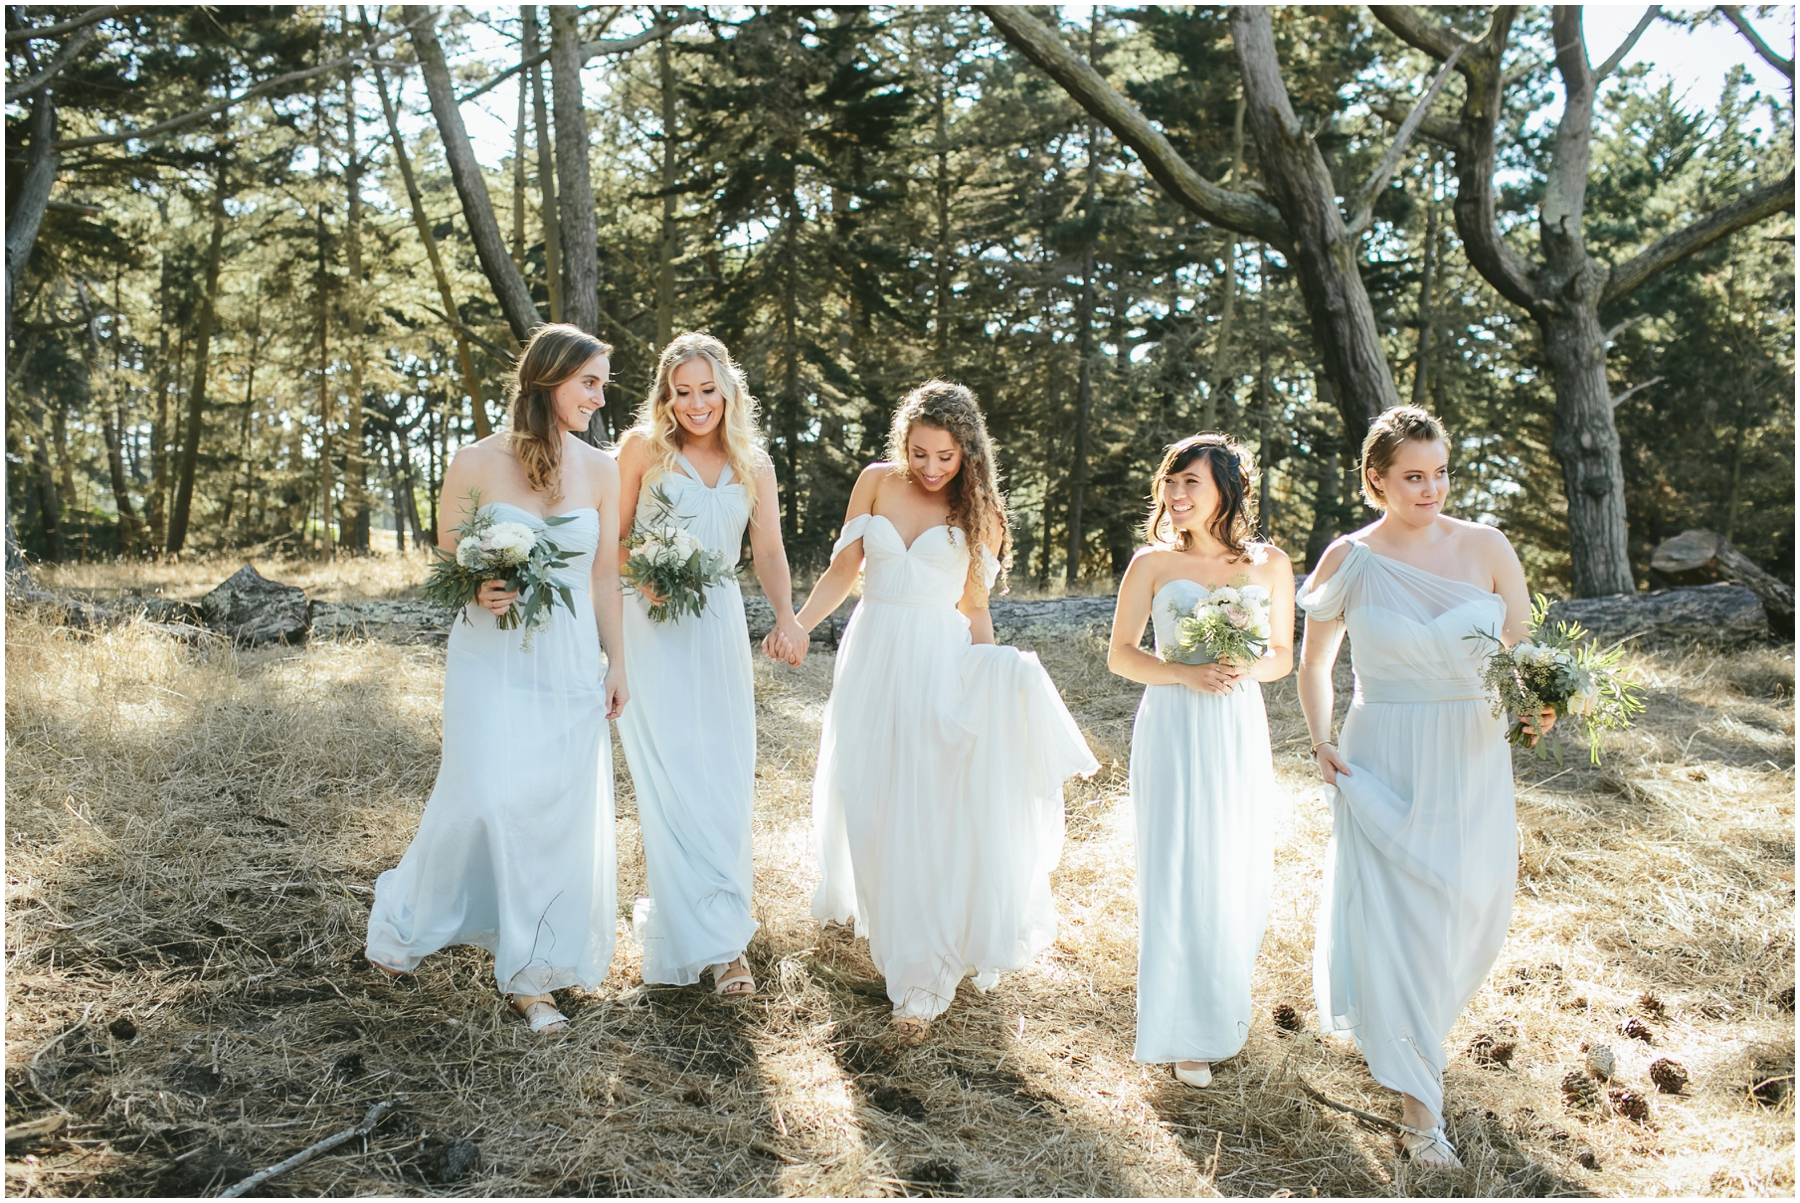 Emily+Paul-WEDDING_KellyBoitanoPhotography_0062